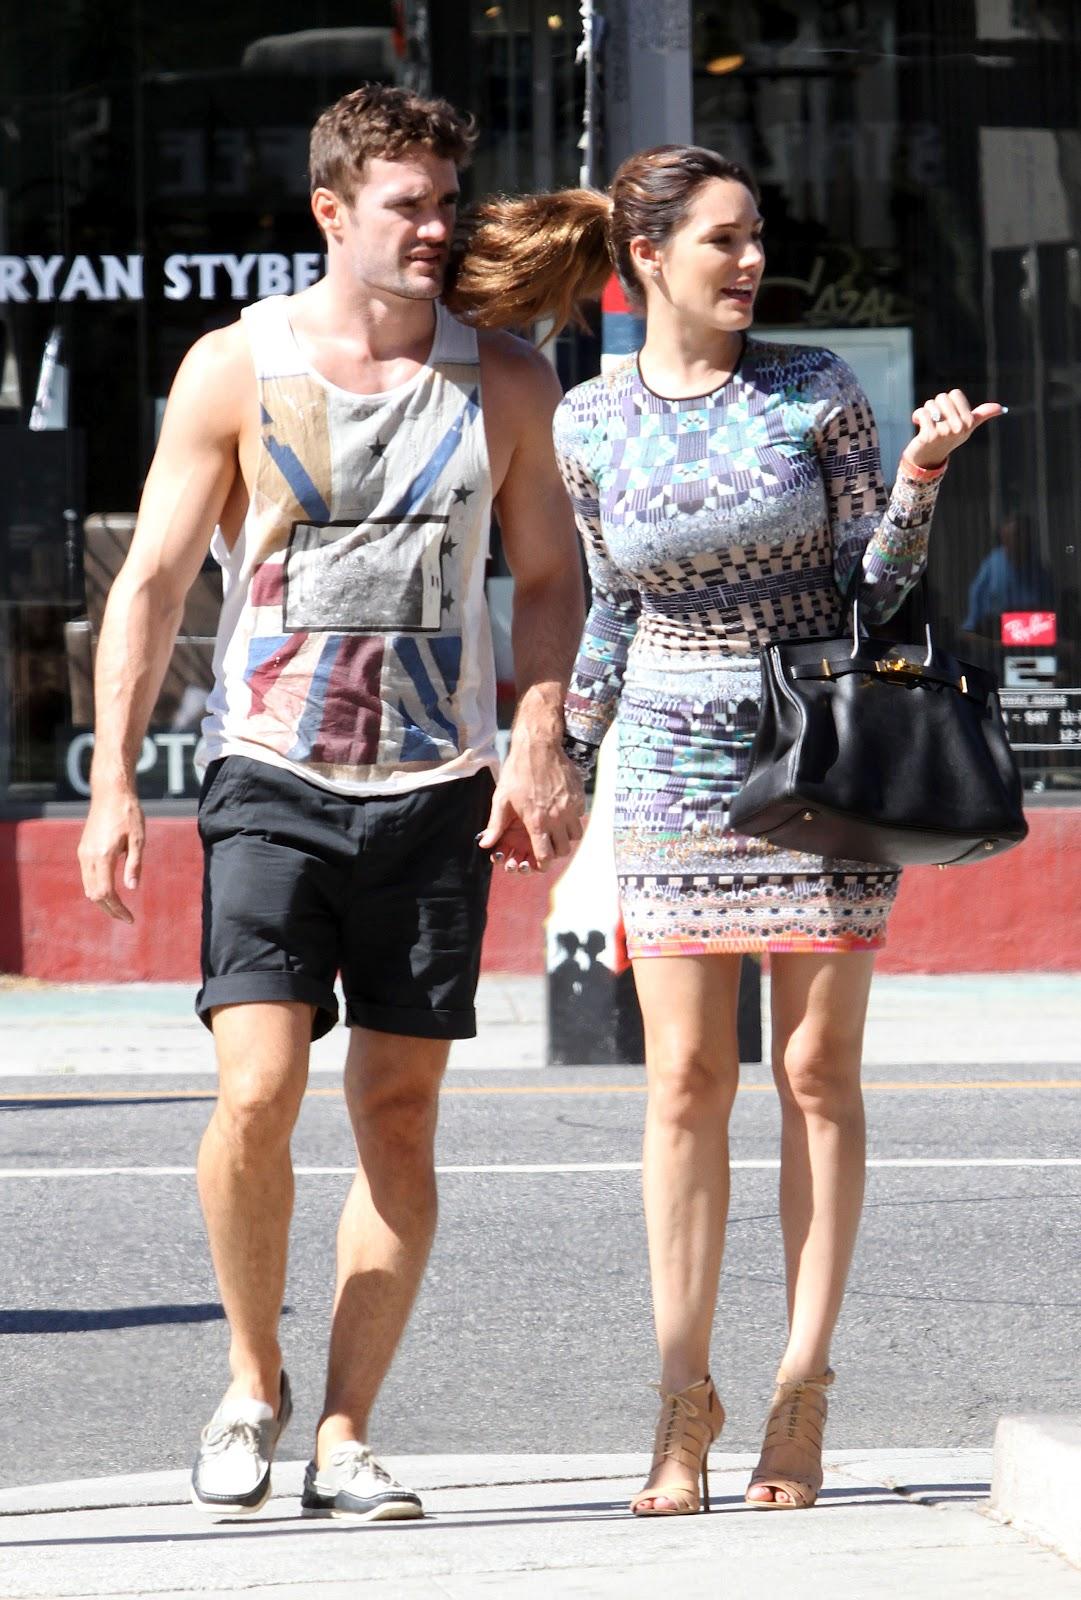 http://4.bp.blogspot.com/-6UquBZYG-Q8/UDtqrdRyiqI/AAAAAAAANjo/Fgwyum6GbMA/s1600/Kelly+Brook+wearing+a+mini+dress+out+in+Los+Angeles+August+25th+2012-03.jpg